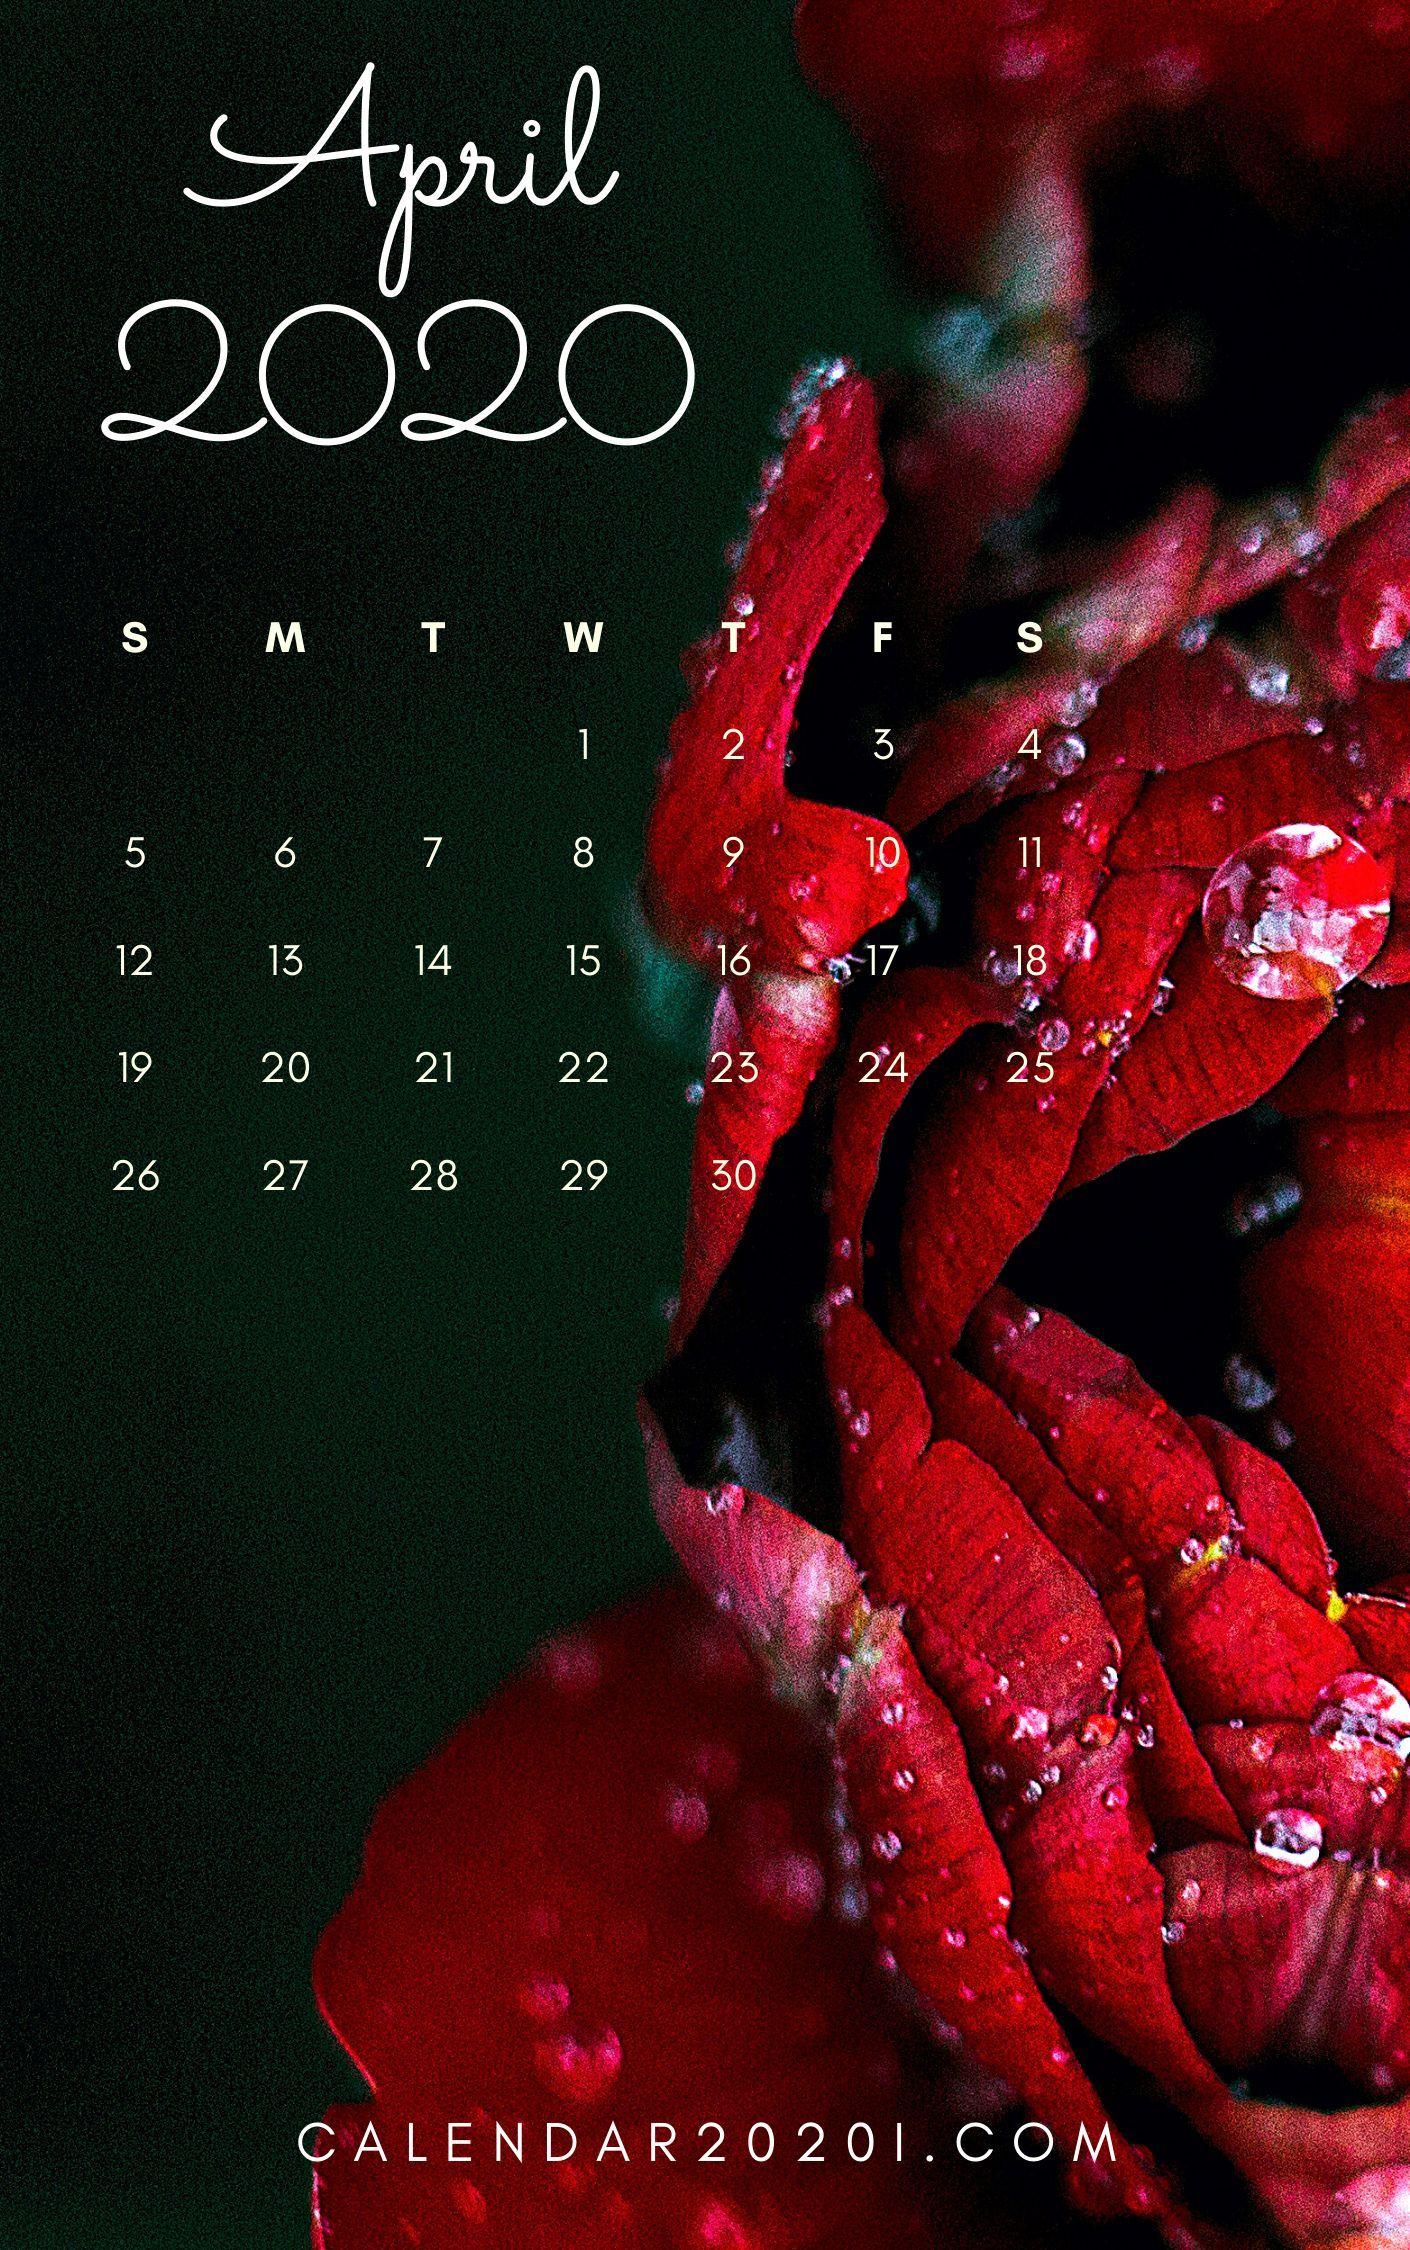 April 2020 Floral Calendar Printable Calendar 2020 in 2020